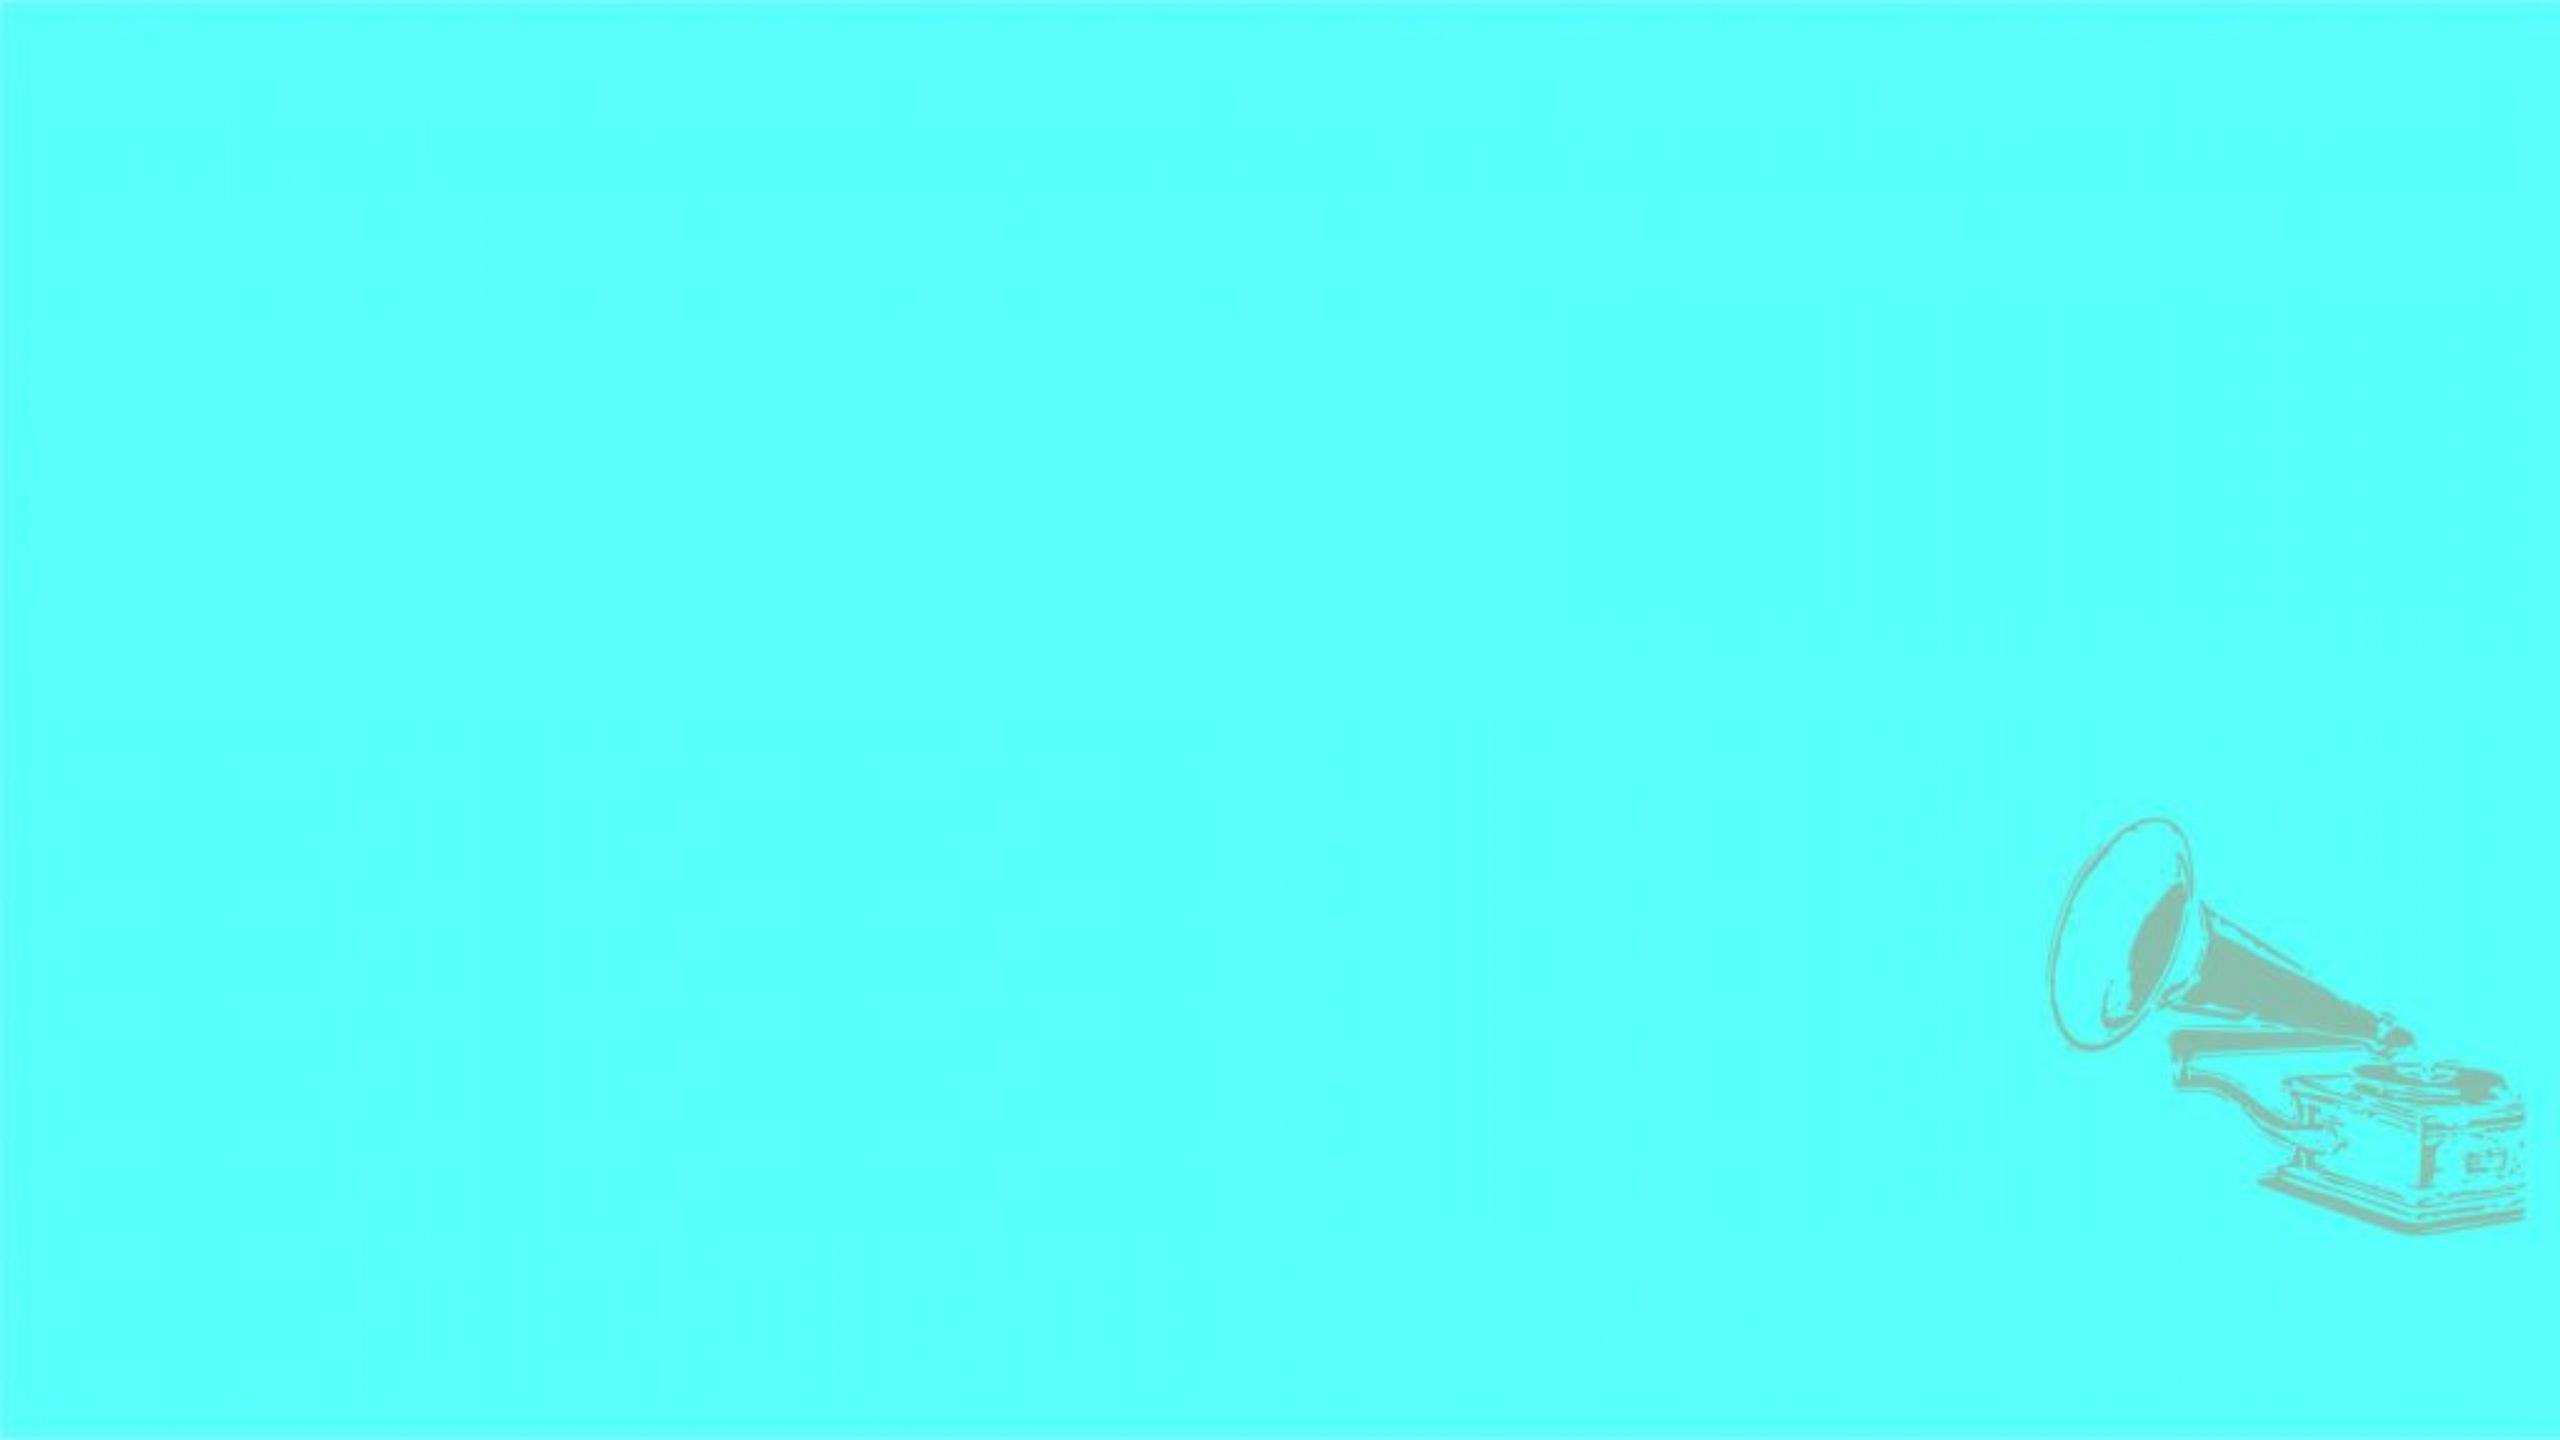 fonografo_banner